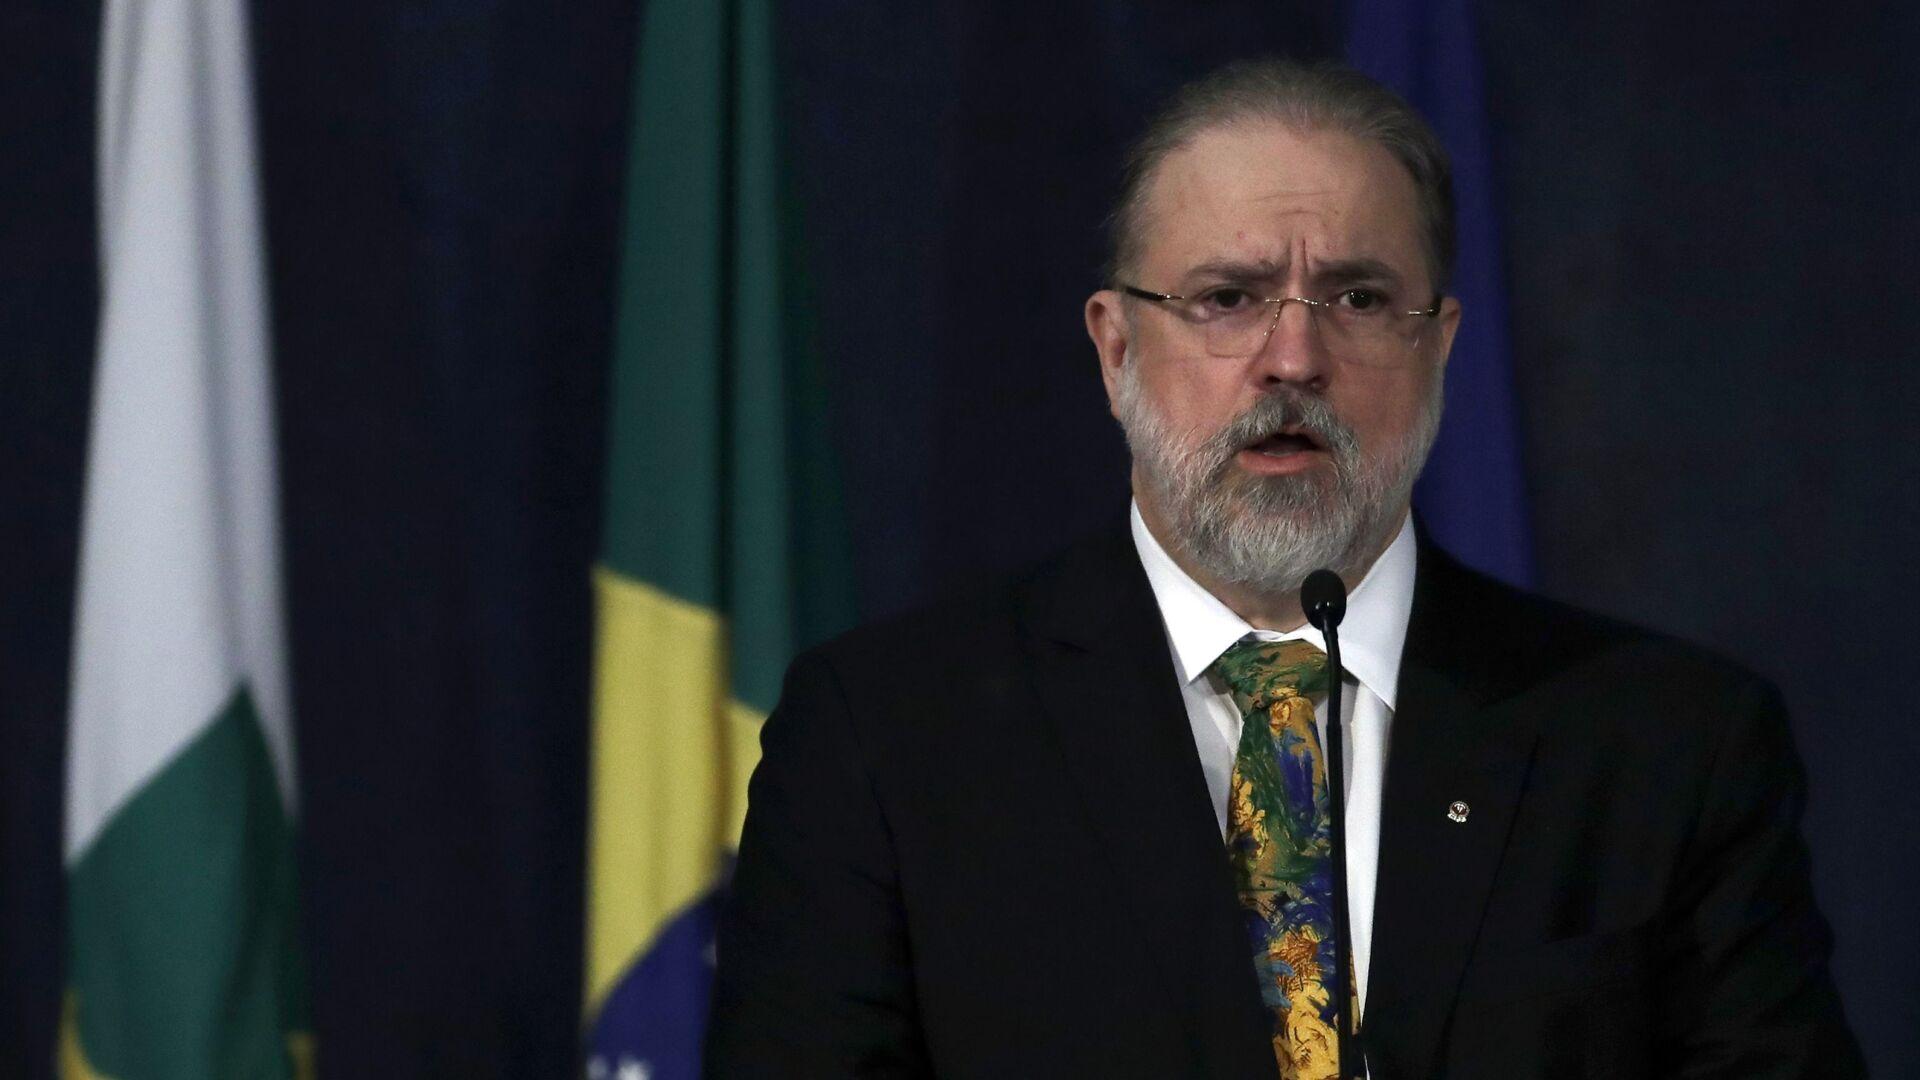 Augusto Aras, el fiscal general de Brasil - Sputnik Mundo, 1920, 24.08.2021